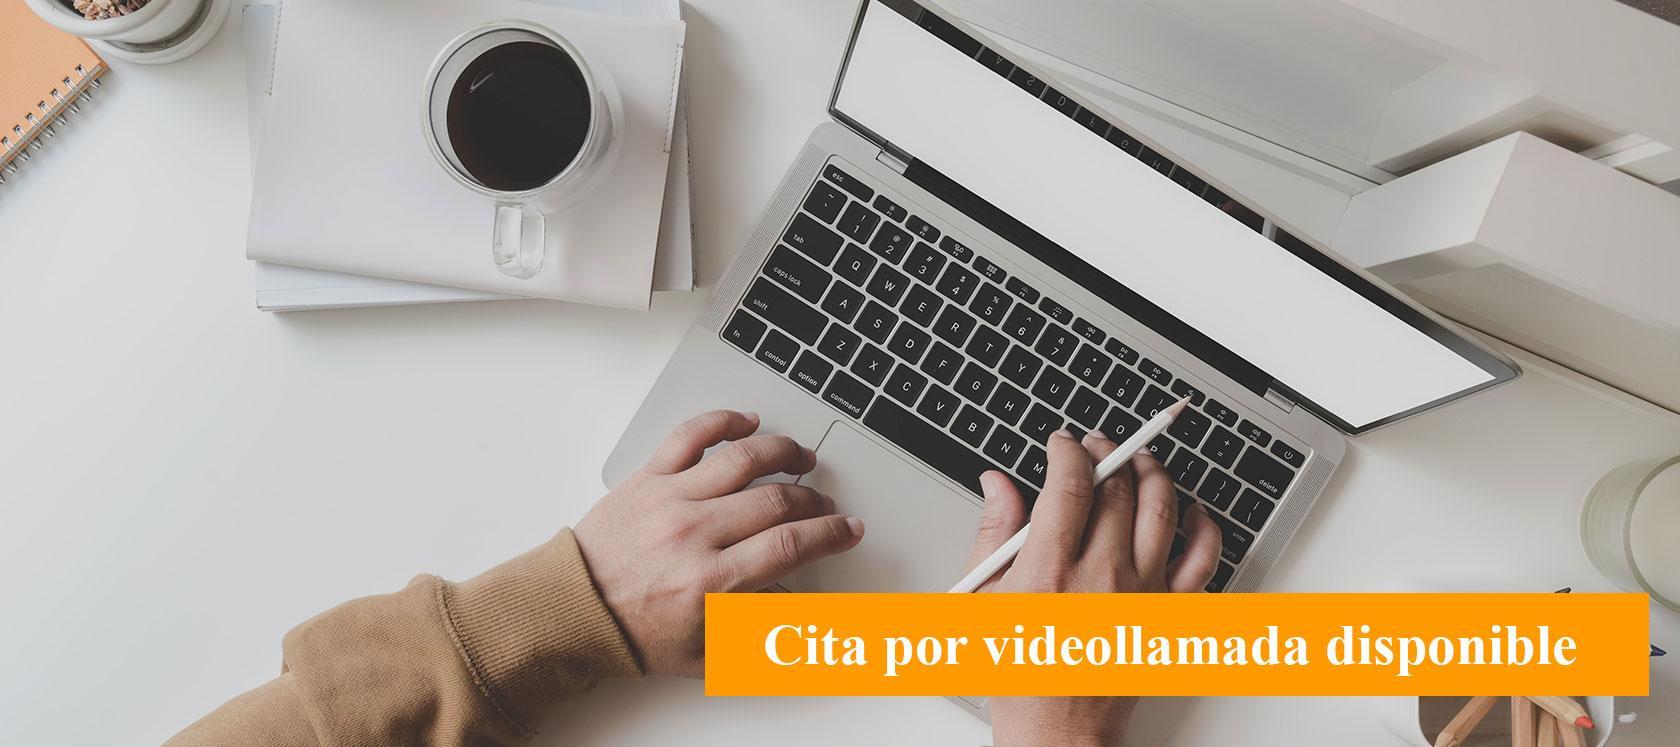 Solicita tu cita por videollamada